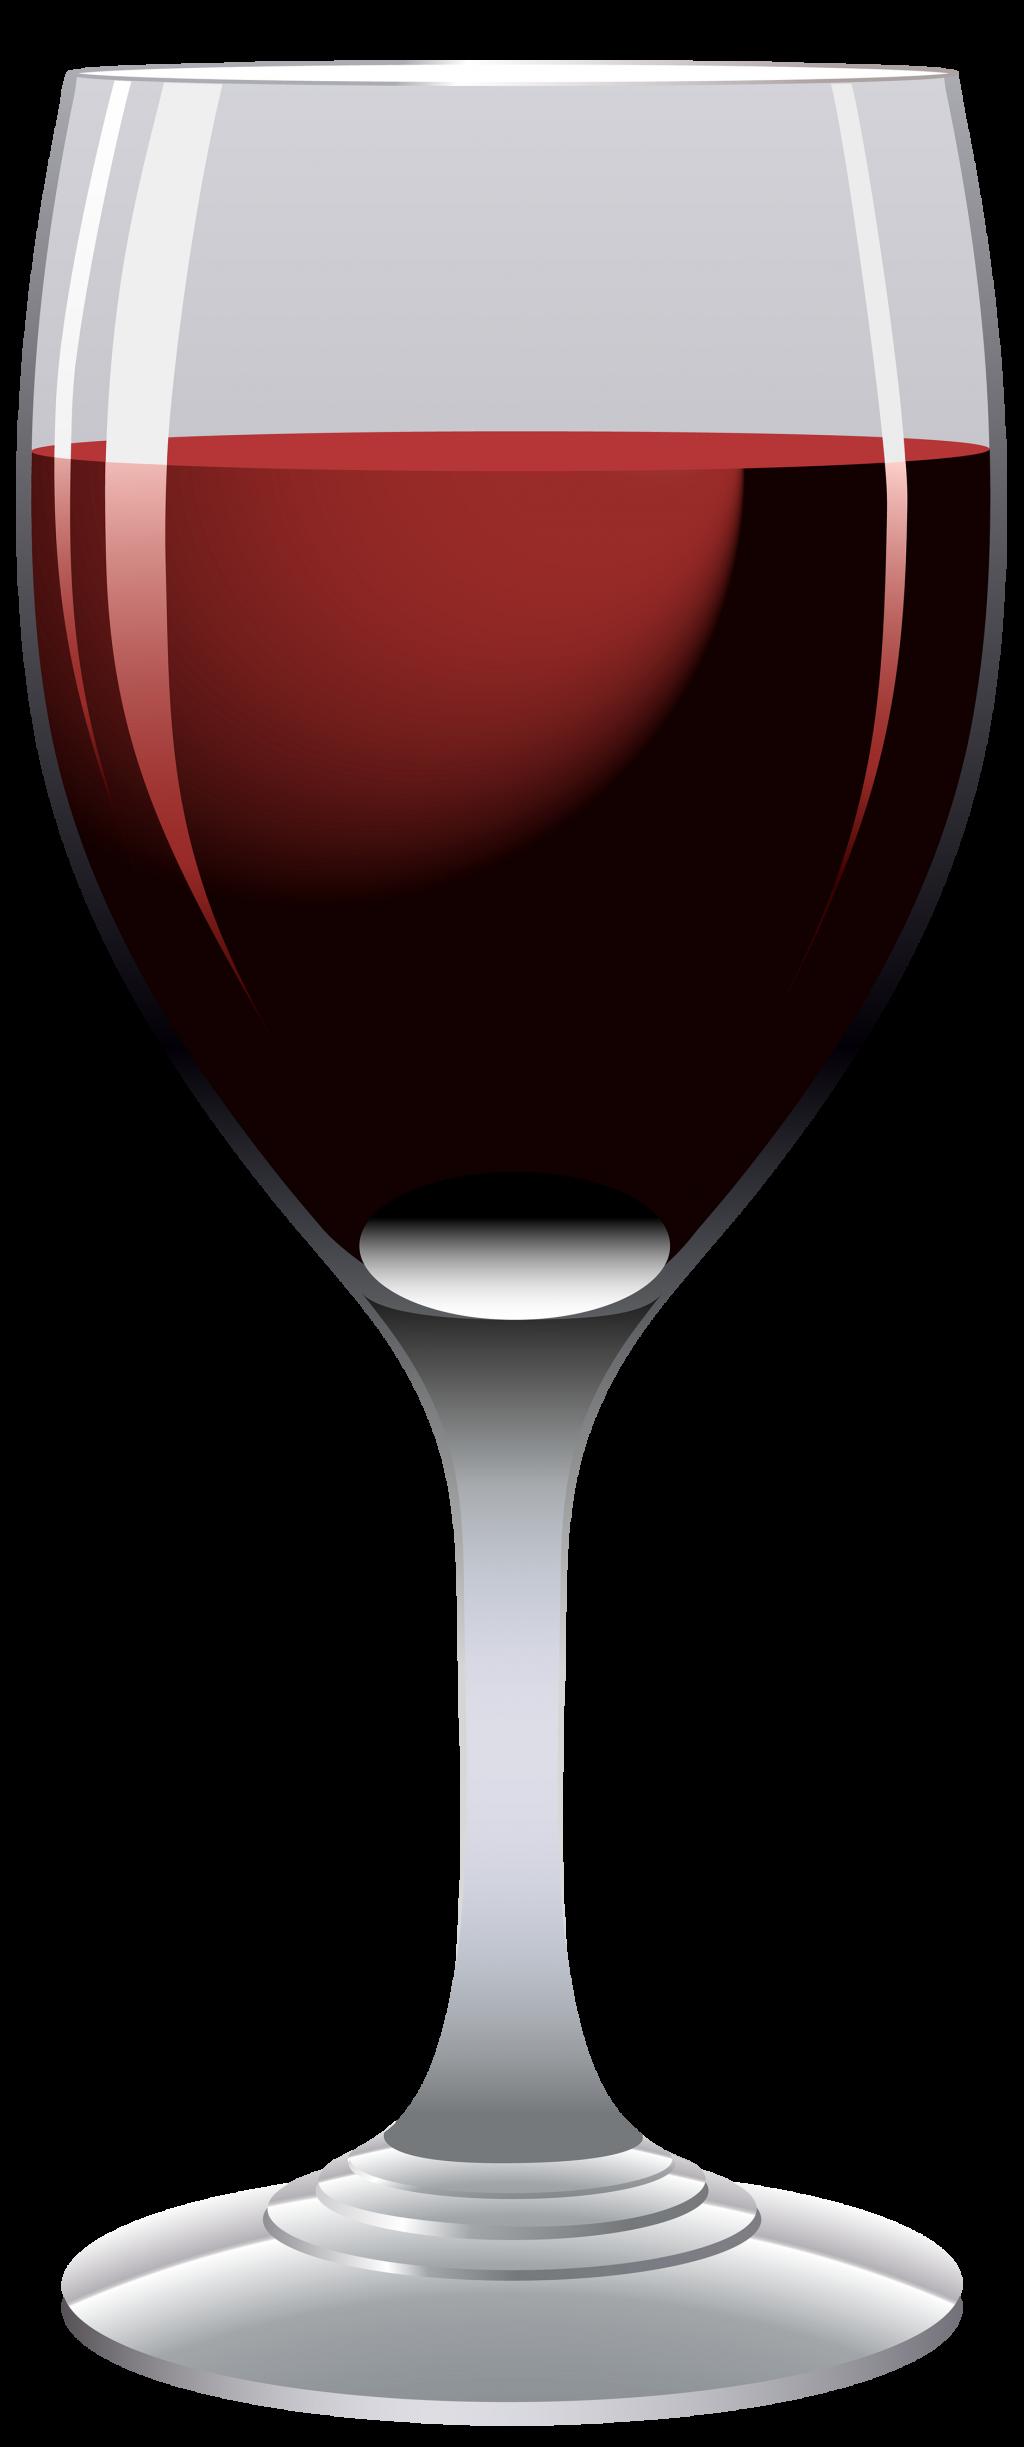 Wine glass clip arts. Glasses clipart goblet